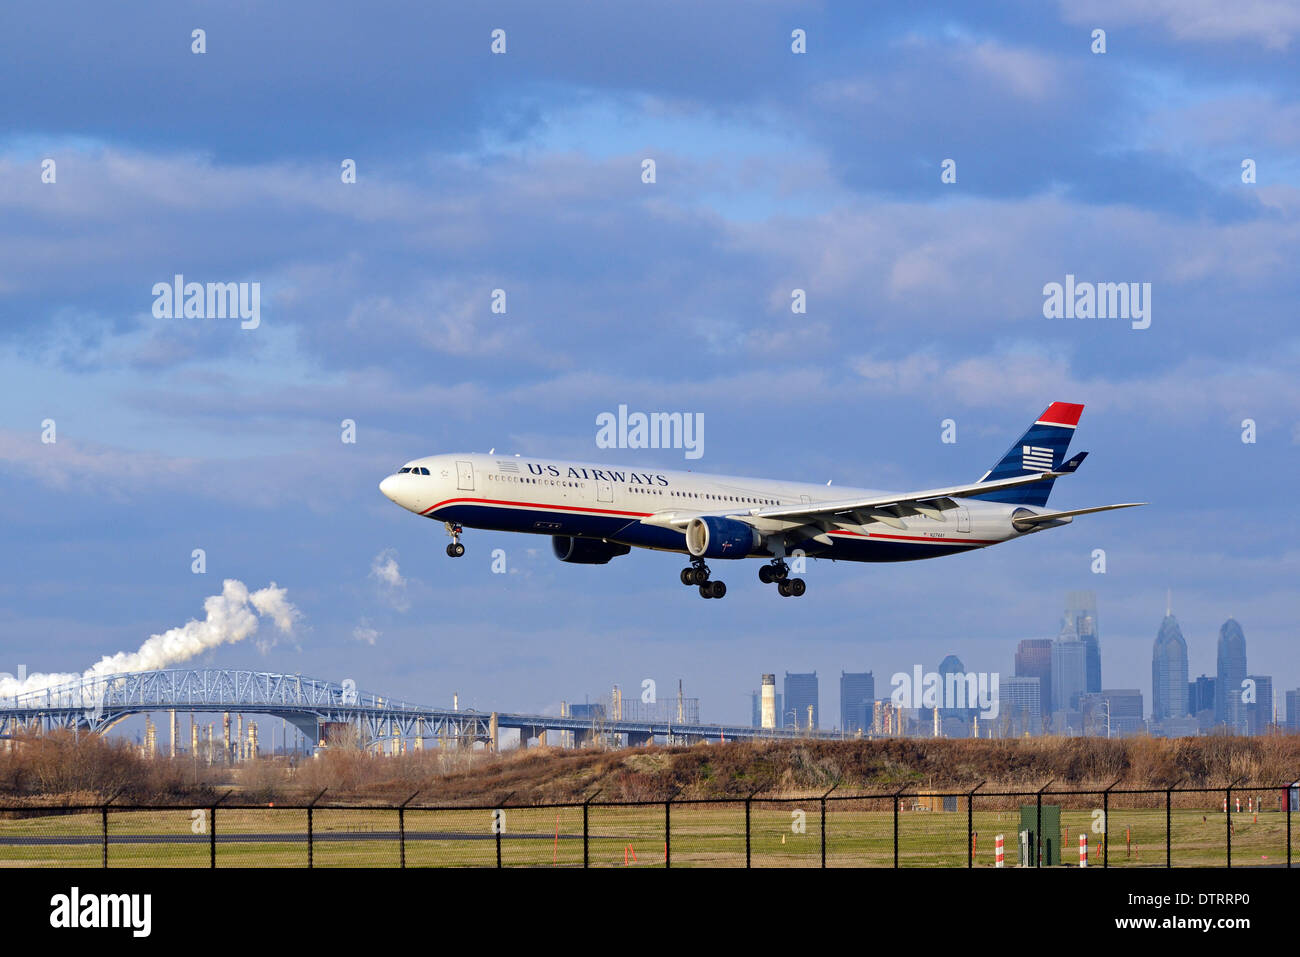 Air travel at Philadelphia International Airport in Philadelphia, Pennsylvania. - Stock Image